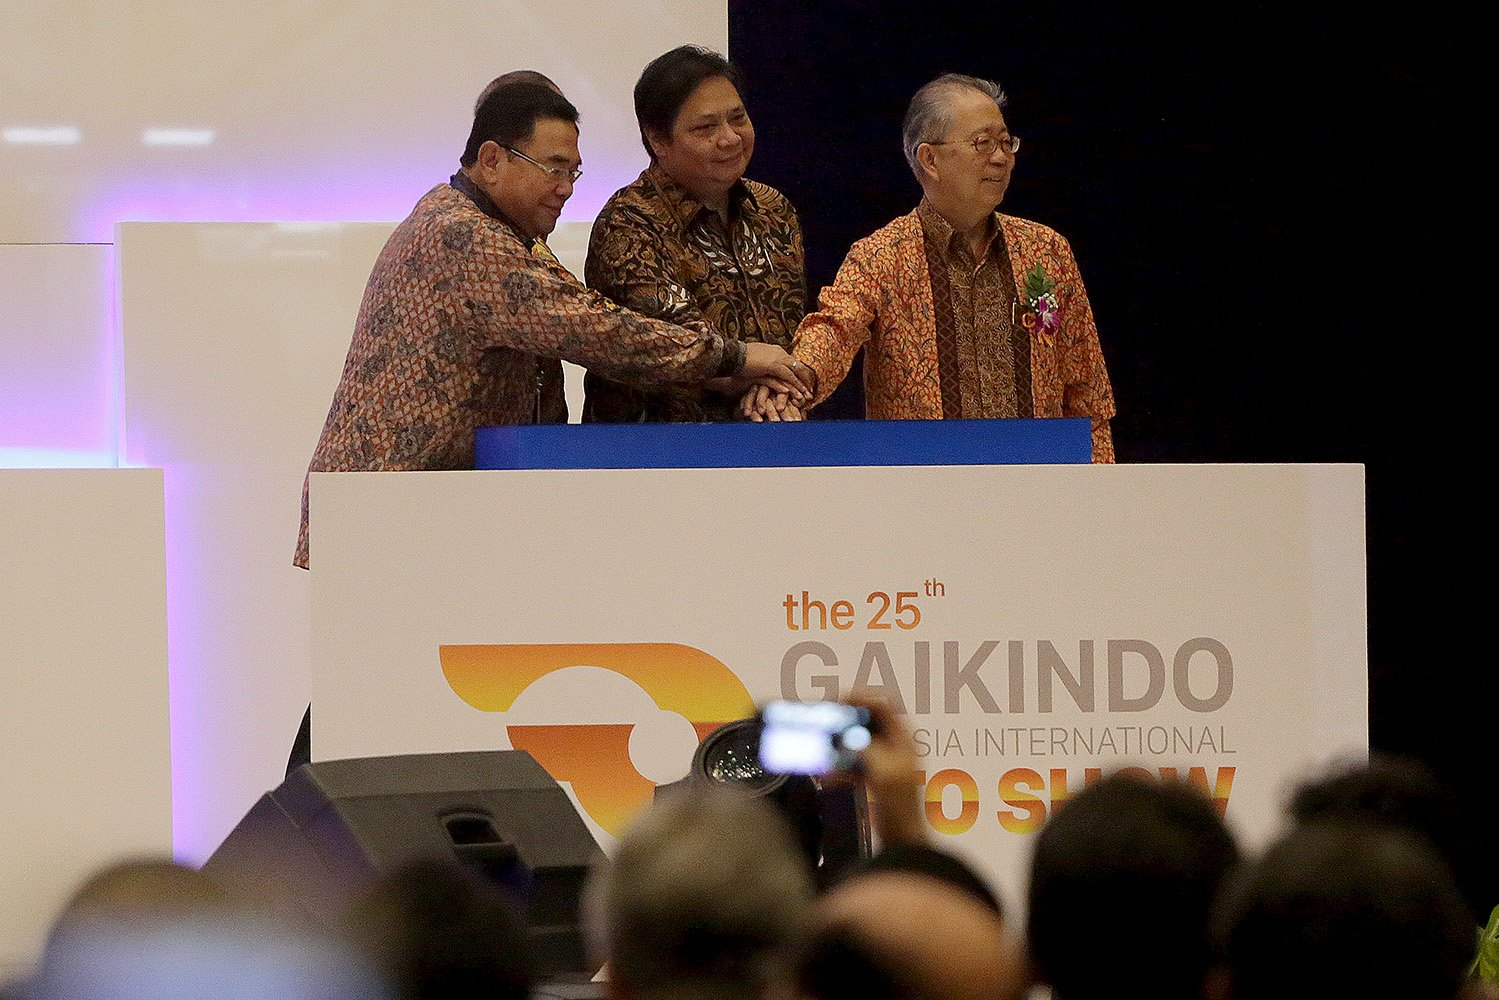 Menteri Perindustrian, Airlangga Hartanto, (tengah) dan Ketua Umum Gaikindo, Yohanes Nangoi (kanan) bersama membuka GIIAS 2017, Tangerang, Banten, Kamis, (10/08).